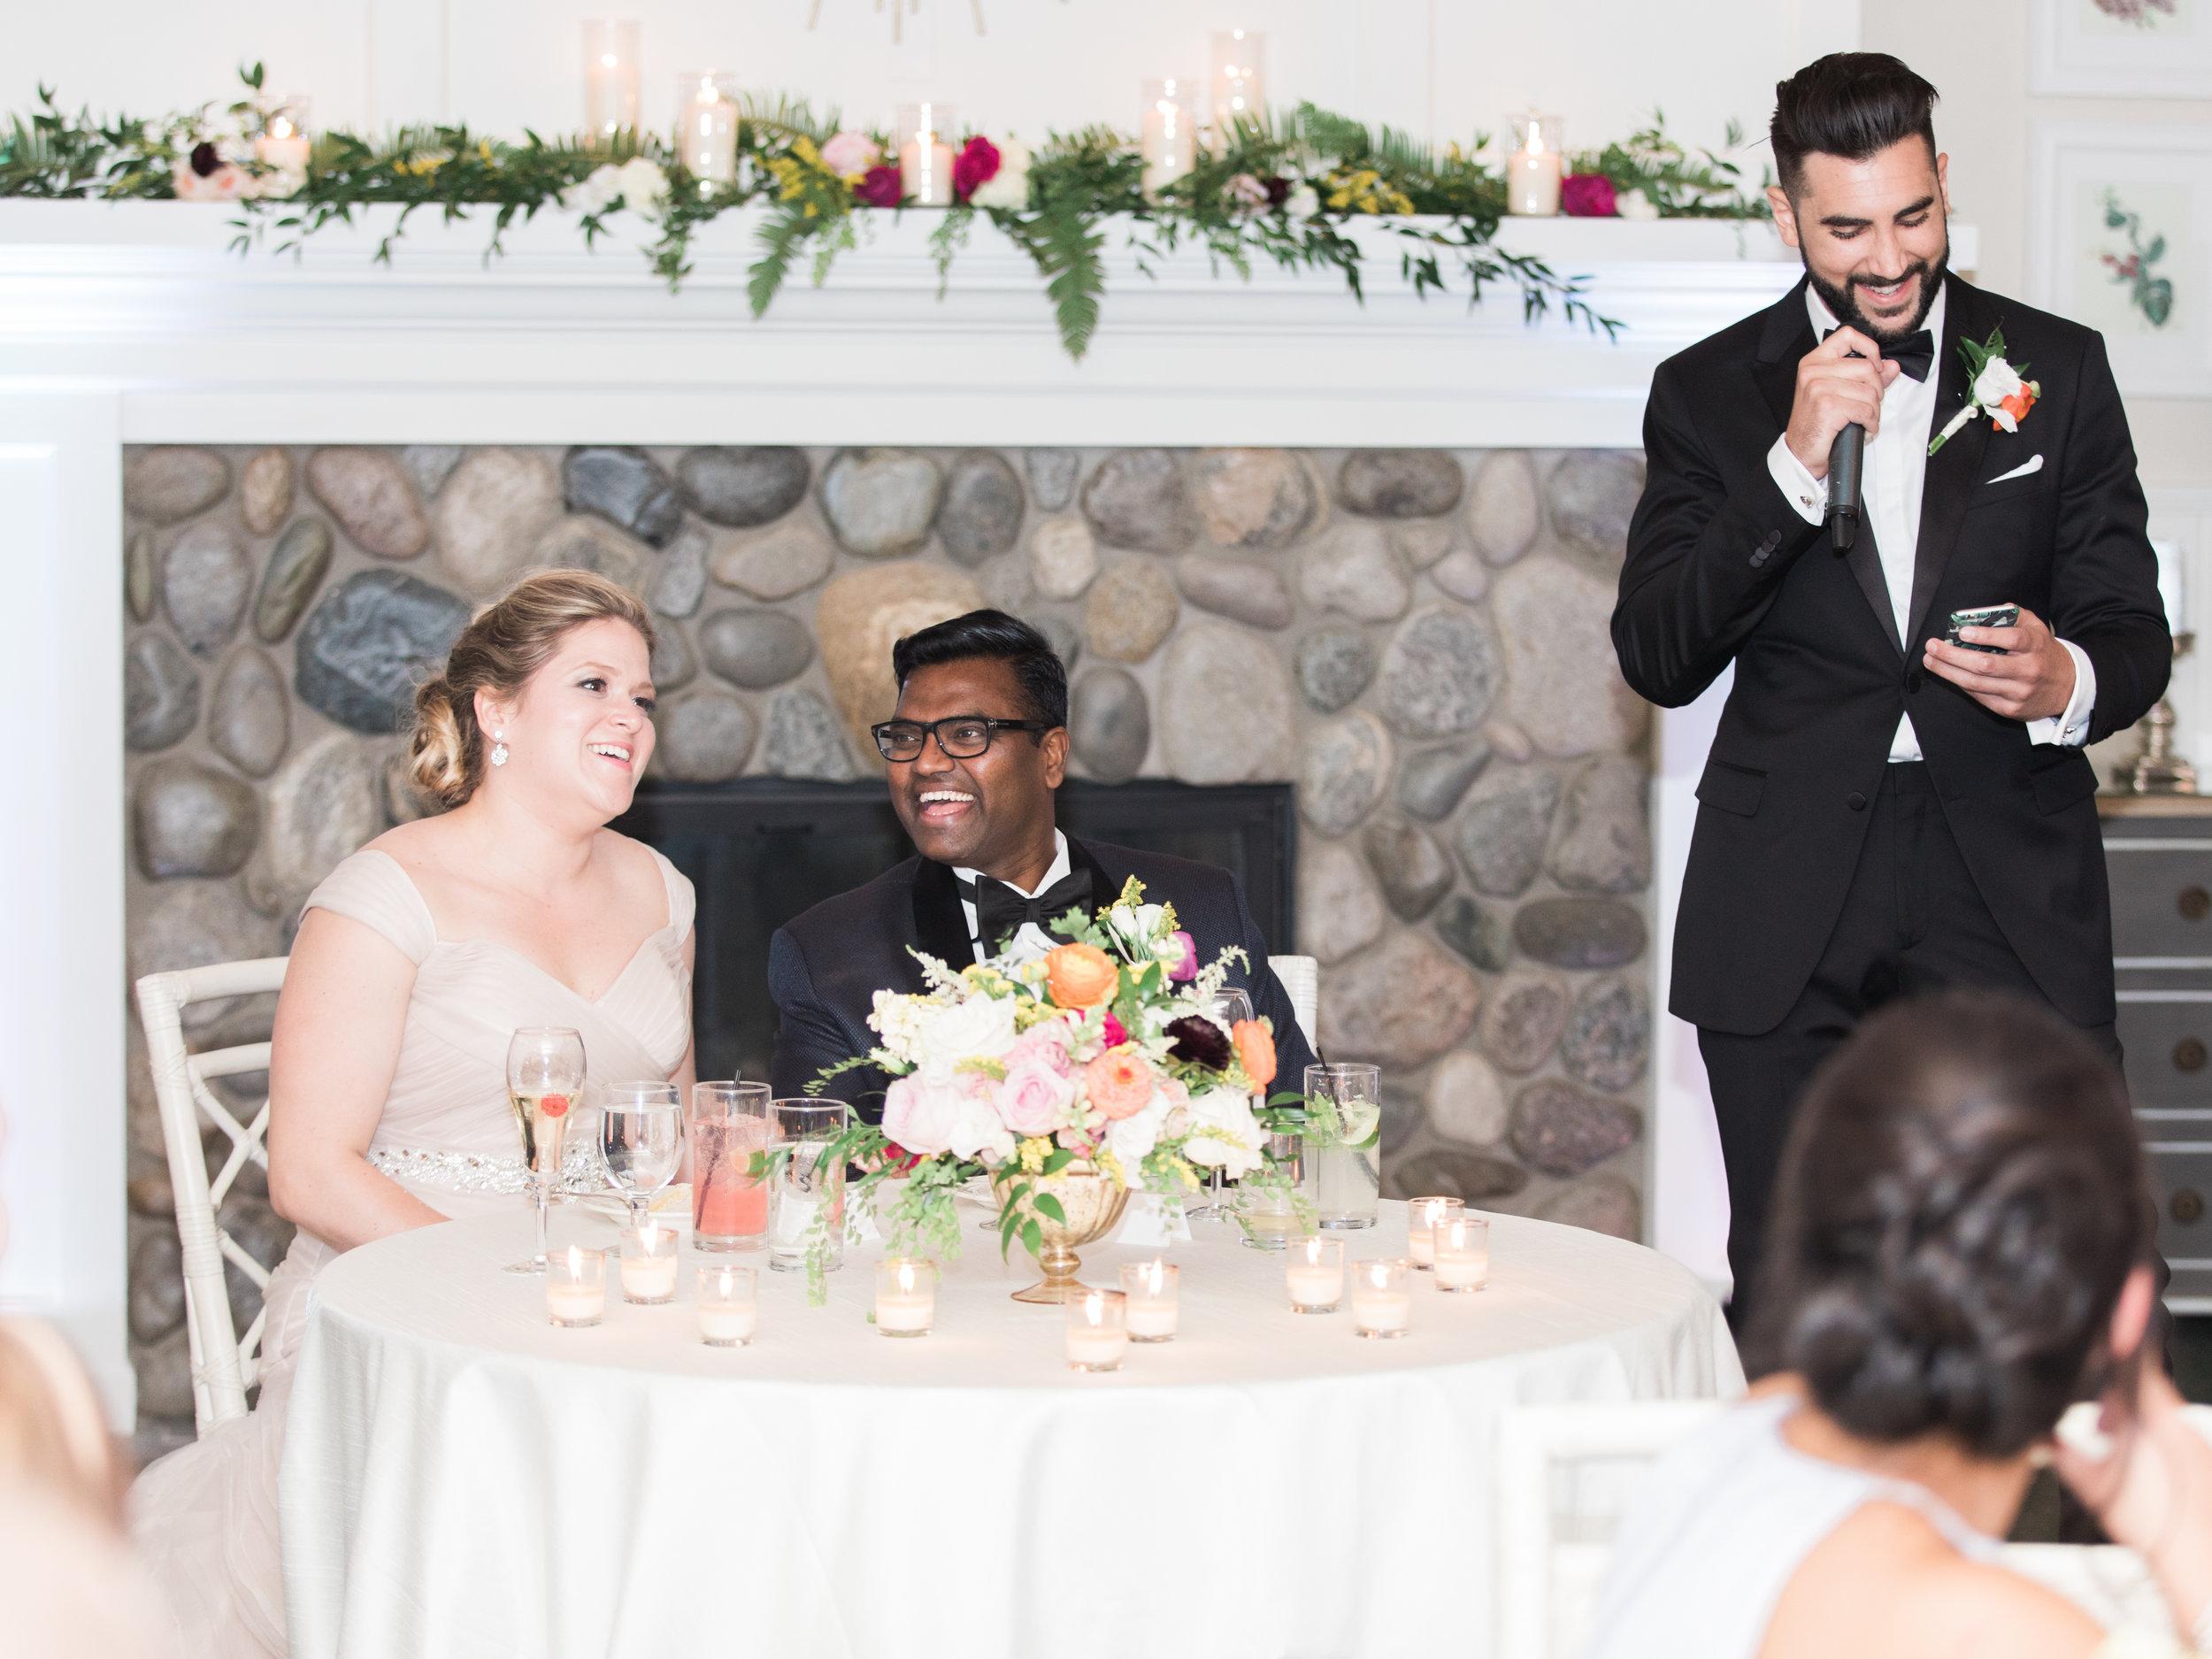 Govathoti+Wedding+Reception+Toasts-54.jpg